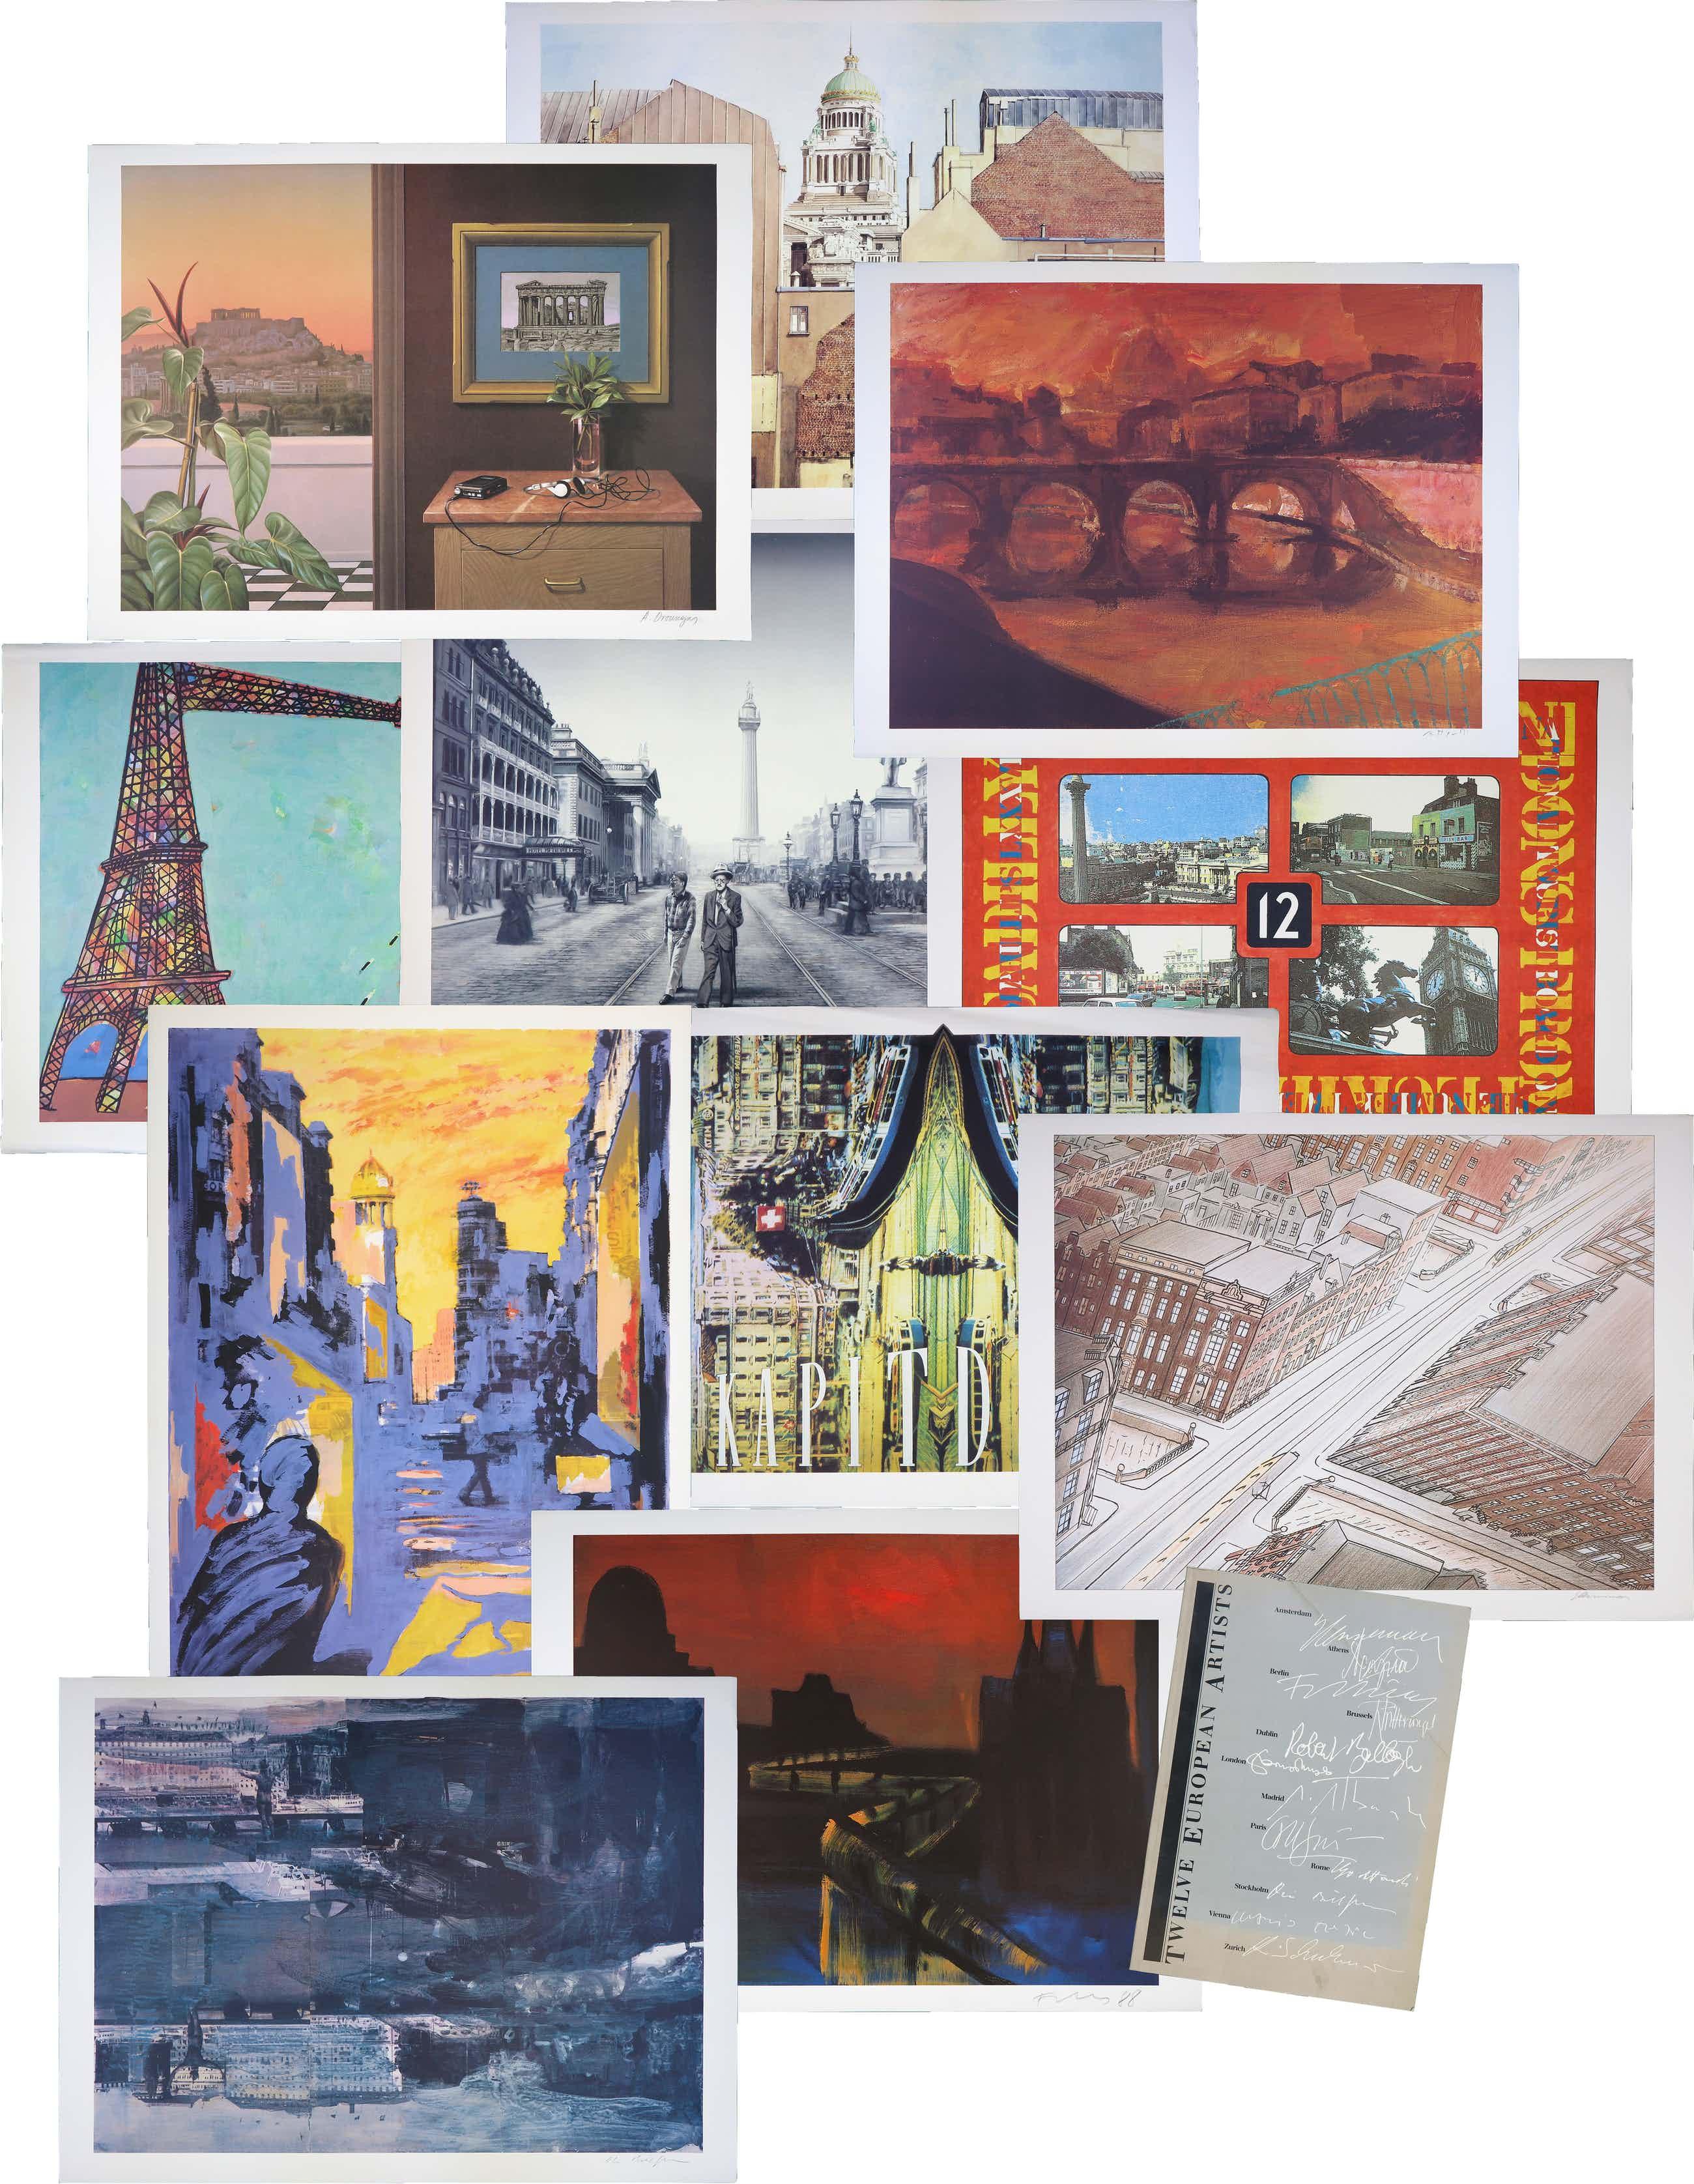 Jeroen Henneman - Antonio Segui, Rainer Fetting e.a. - Serie Twelve European Artists + Boek kopen? Bied vanaf 160!